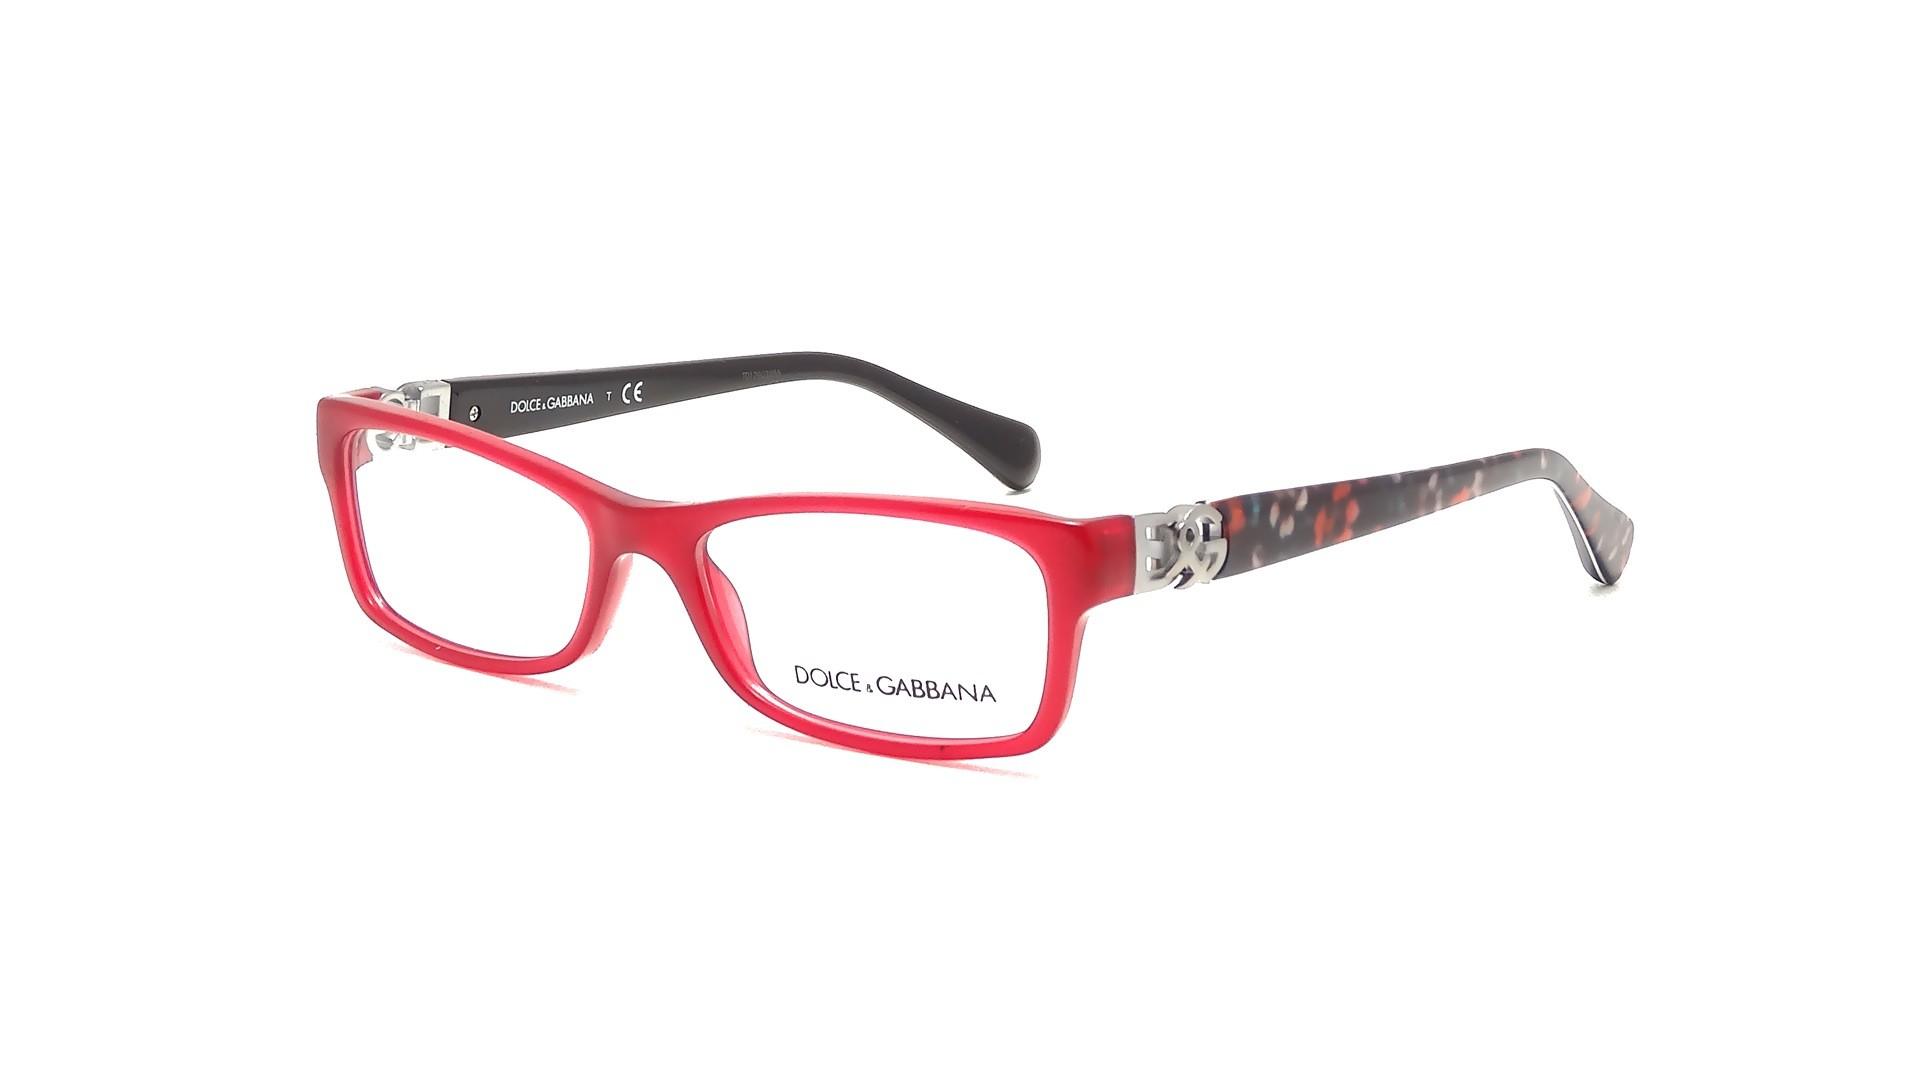 Glasses Frames Recto Or Quiapo : Eye glasses Dolce & Gabbana DG 3147P 2782 Purple Small